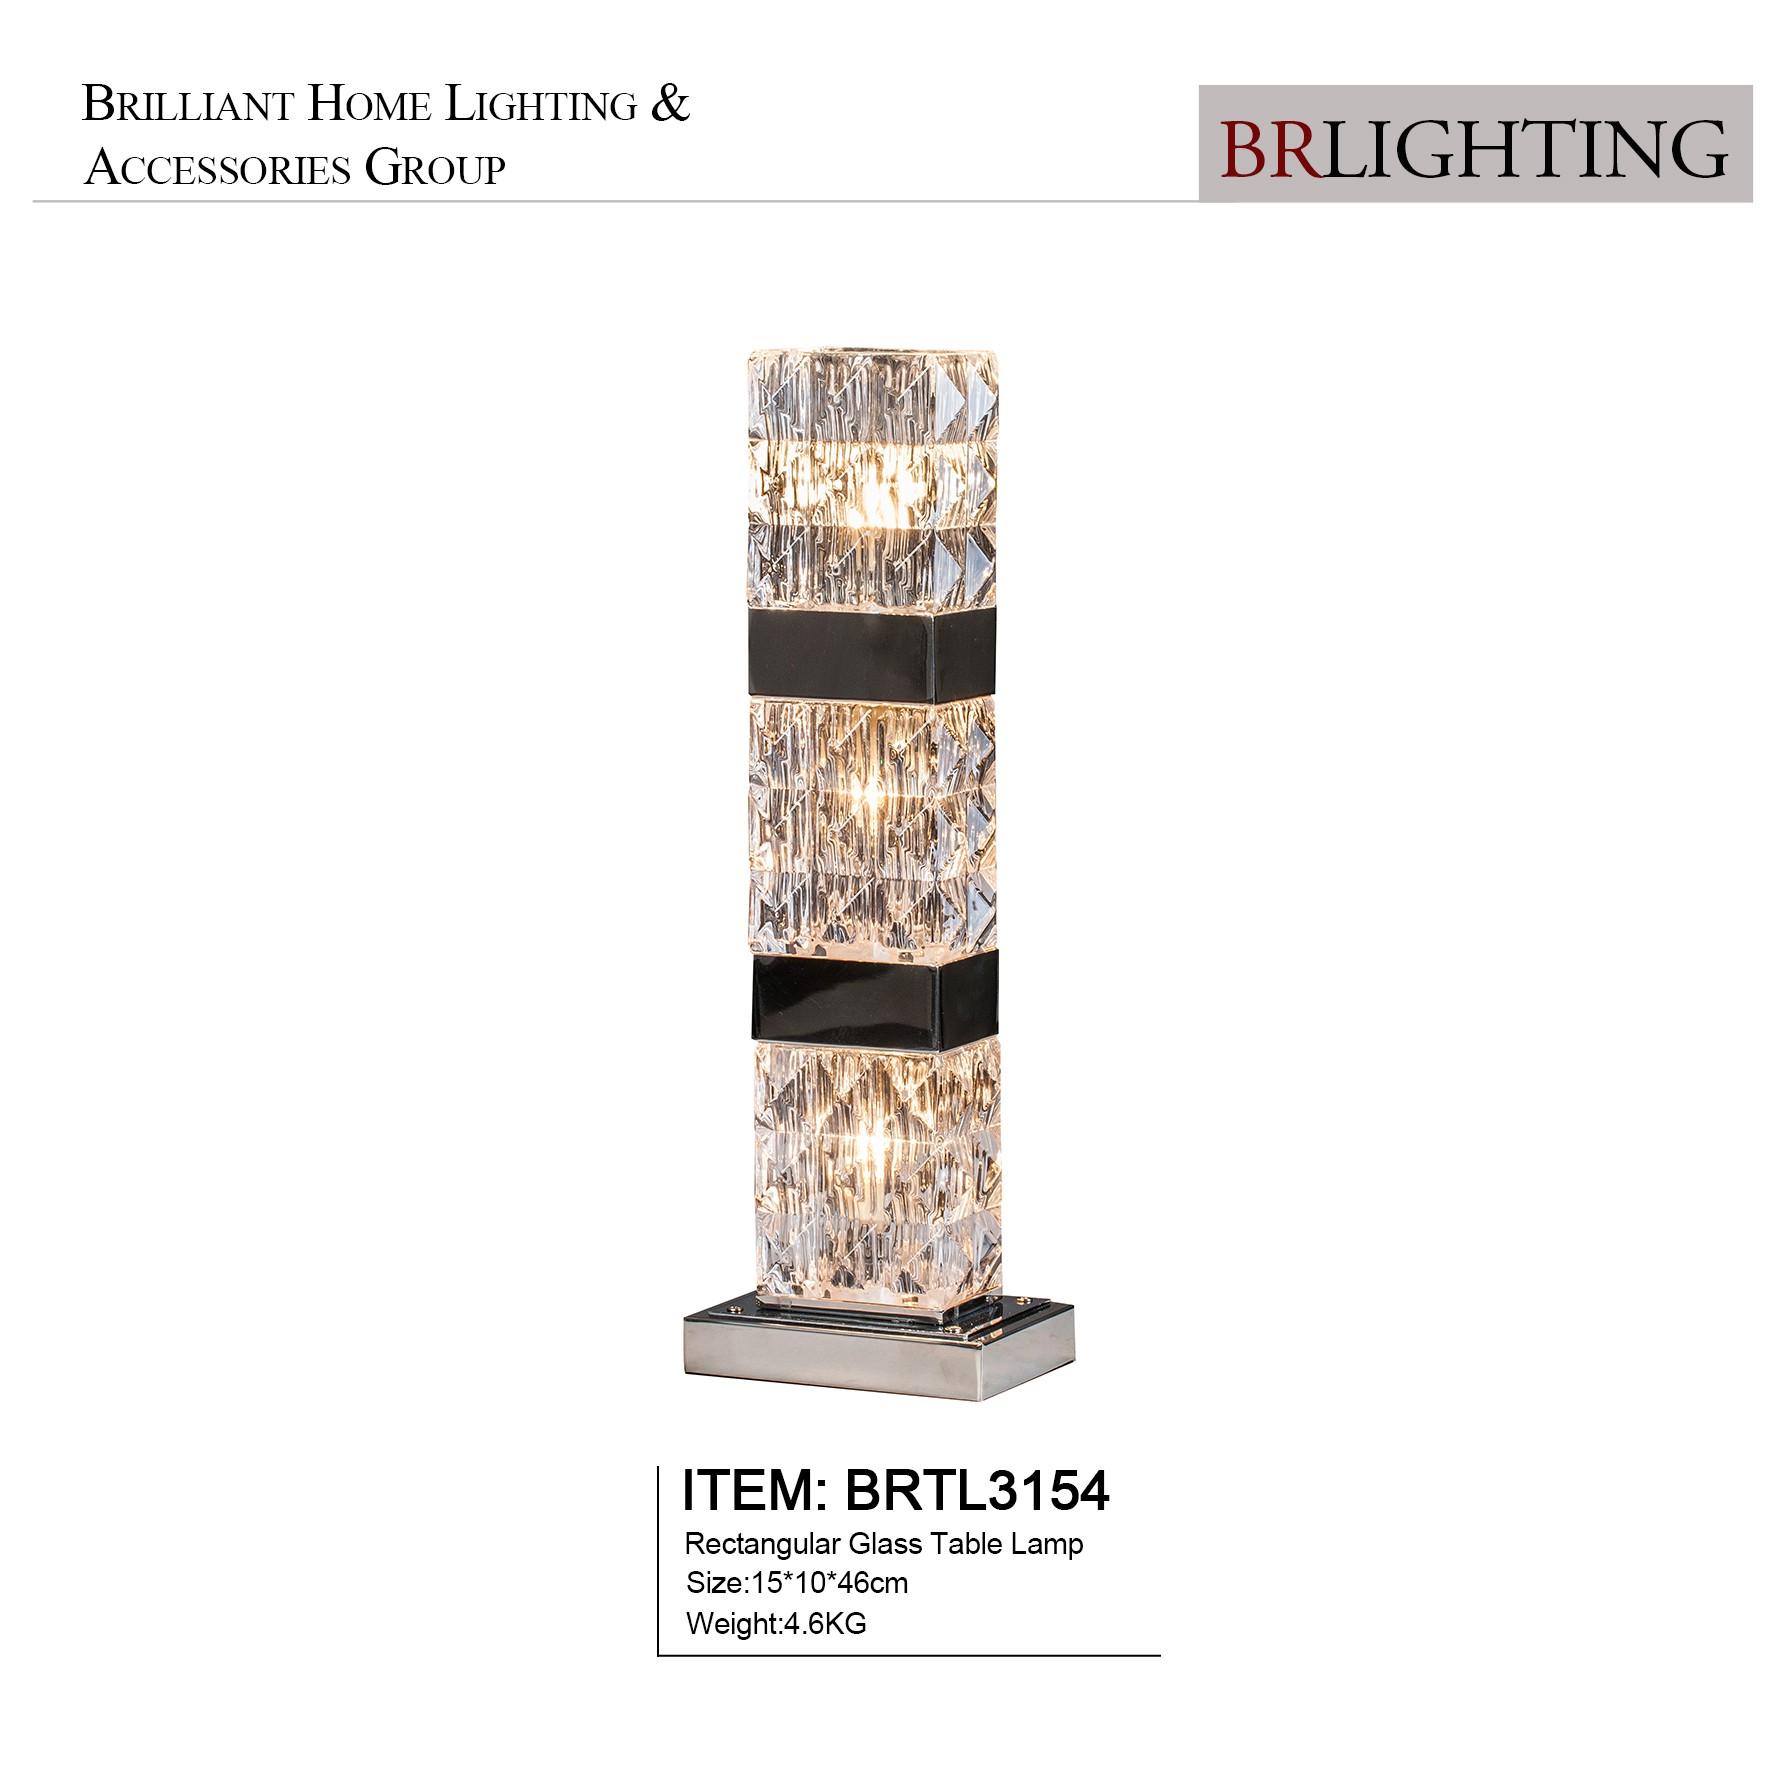 Rectangular Glass Table Lamps